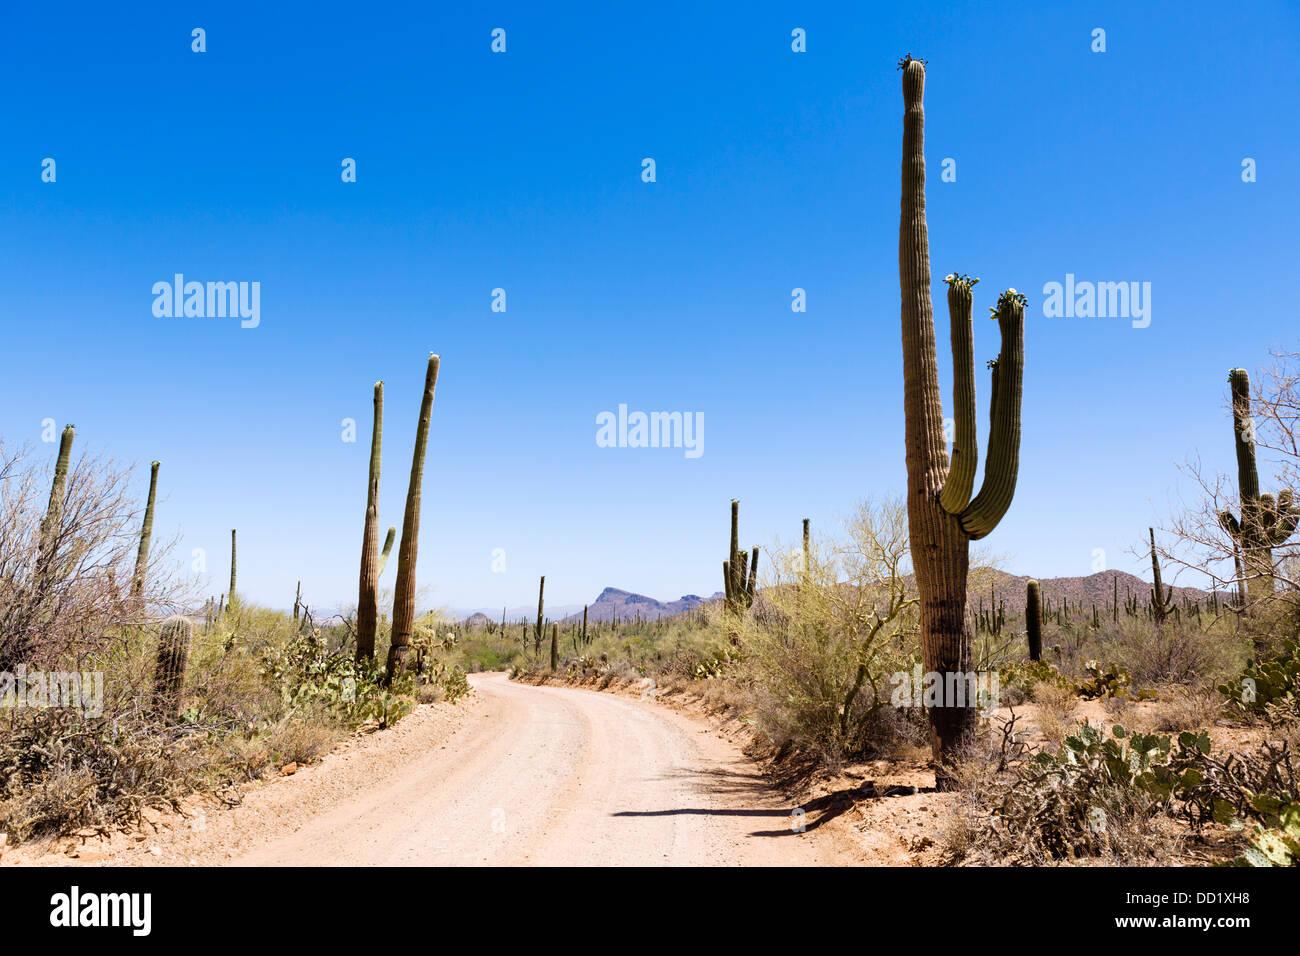 Straße durch Saguaro National Park West, Tucson, Arizona, USA Stockbild